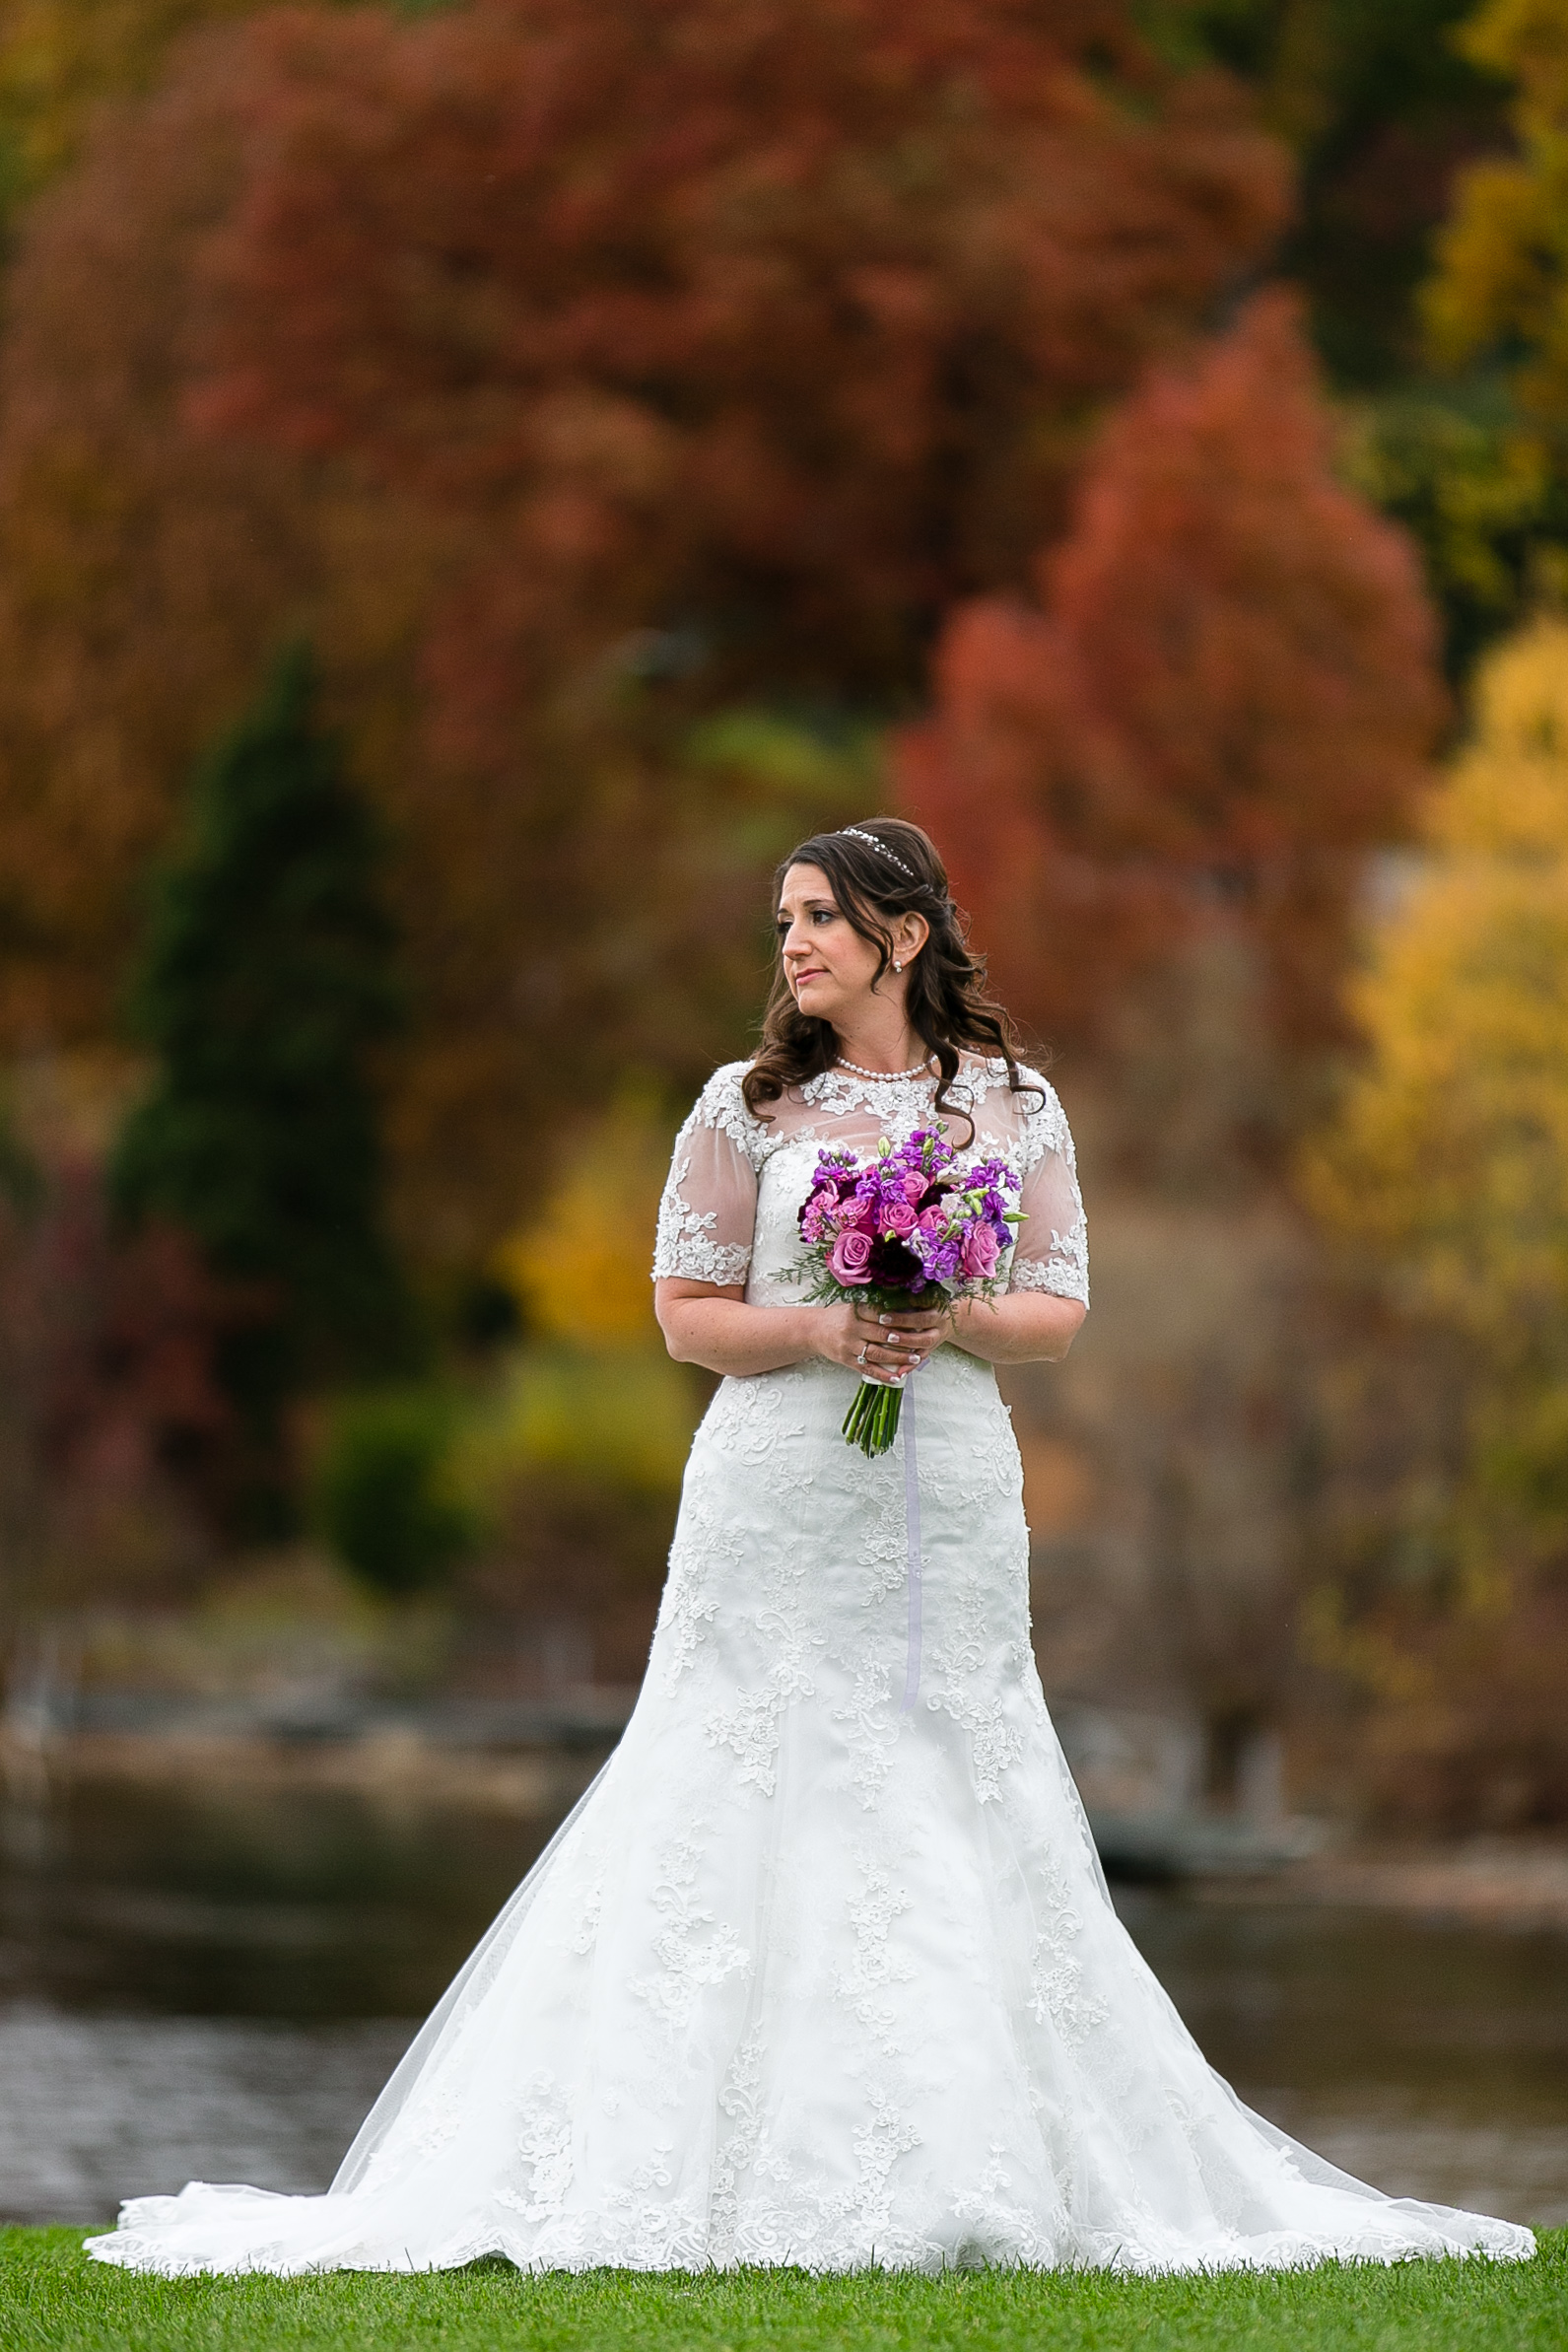 Connecticut-Fall-Wedding-Candlewood-Inn-CT-Documentary-Wedding-Photographer-Jacek-Dolata-111-5.jpg